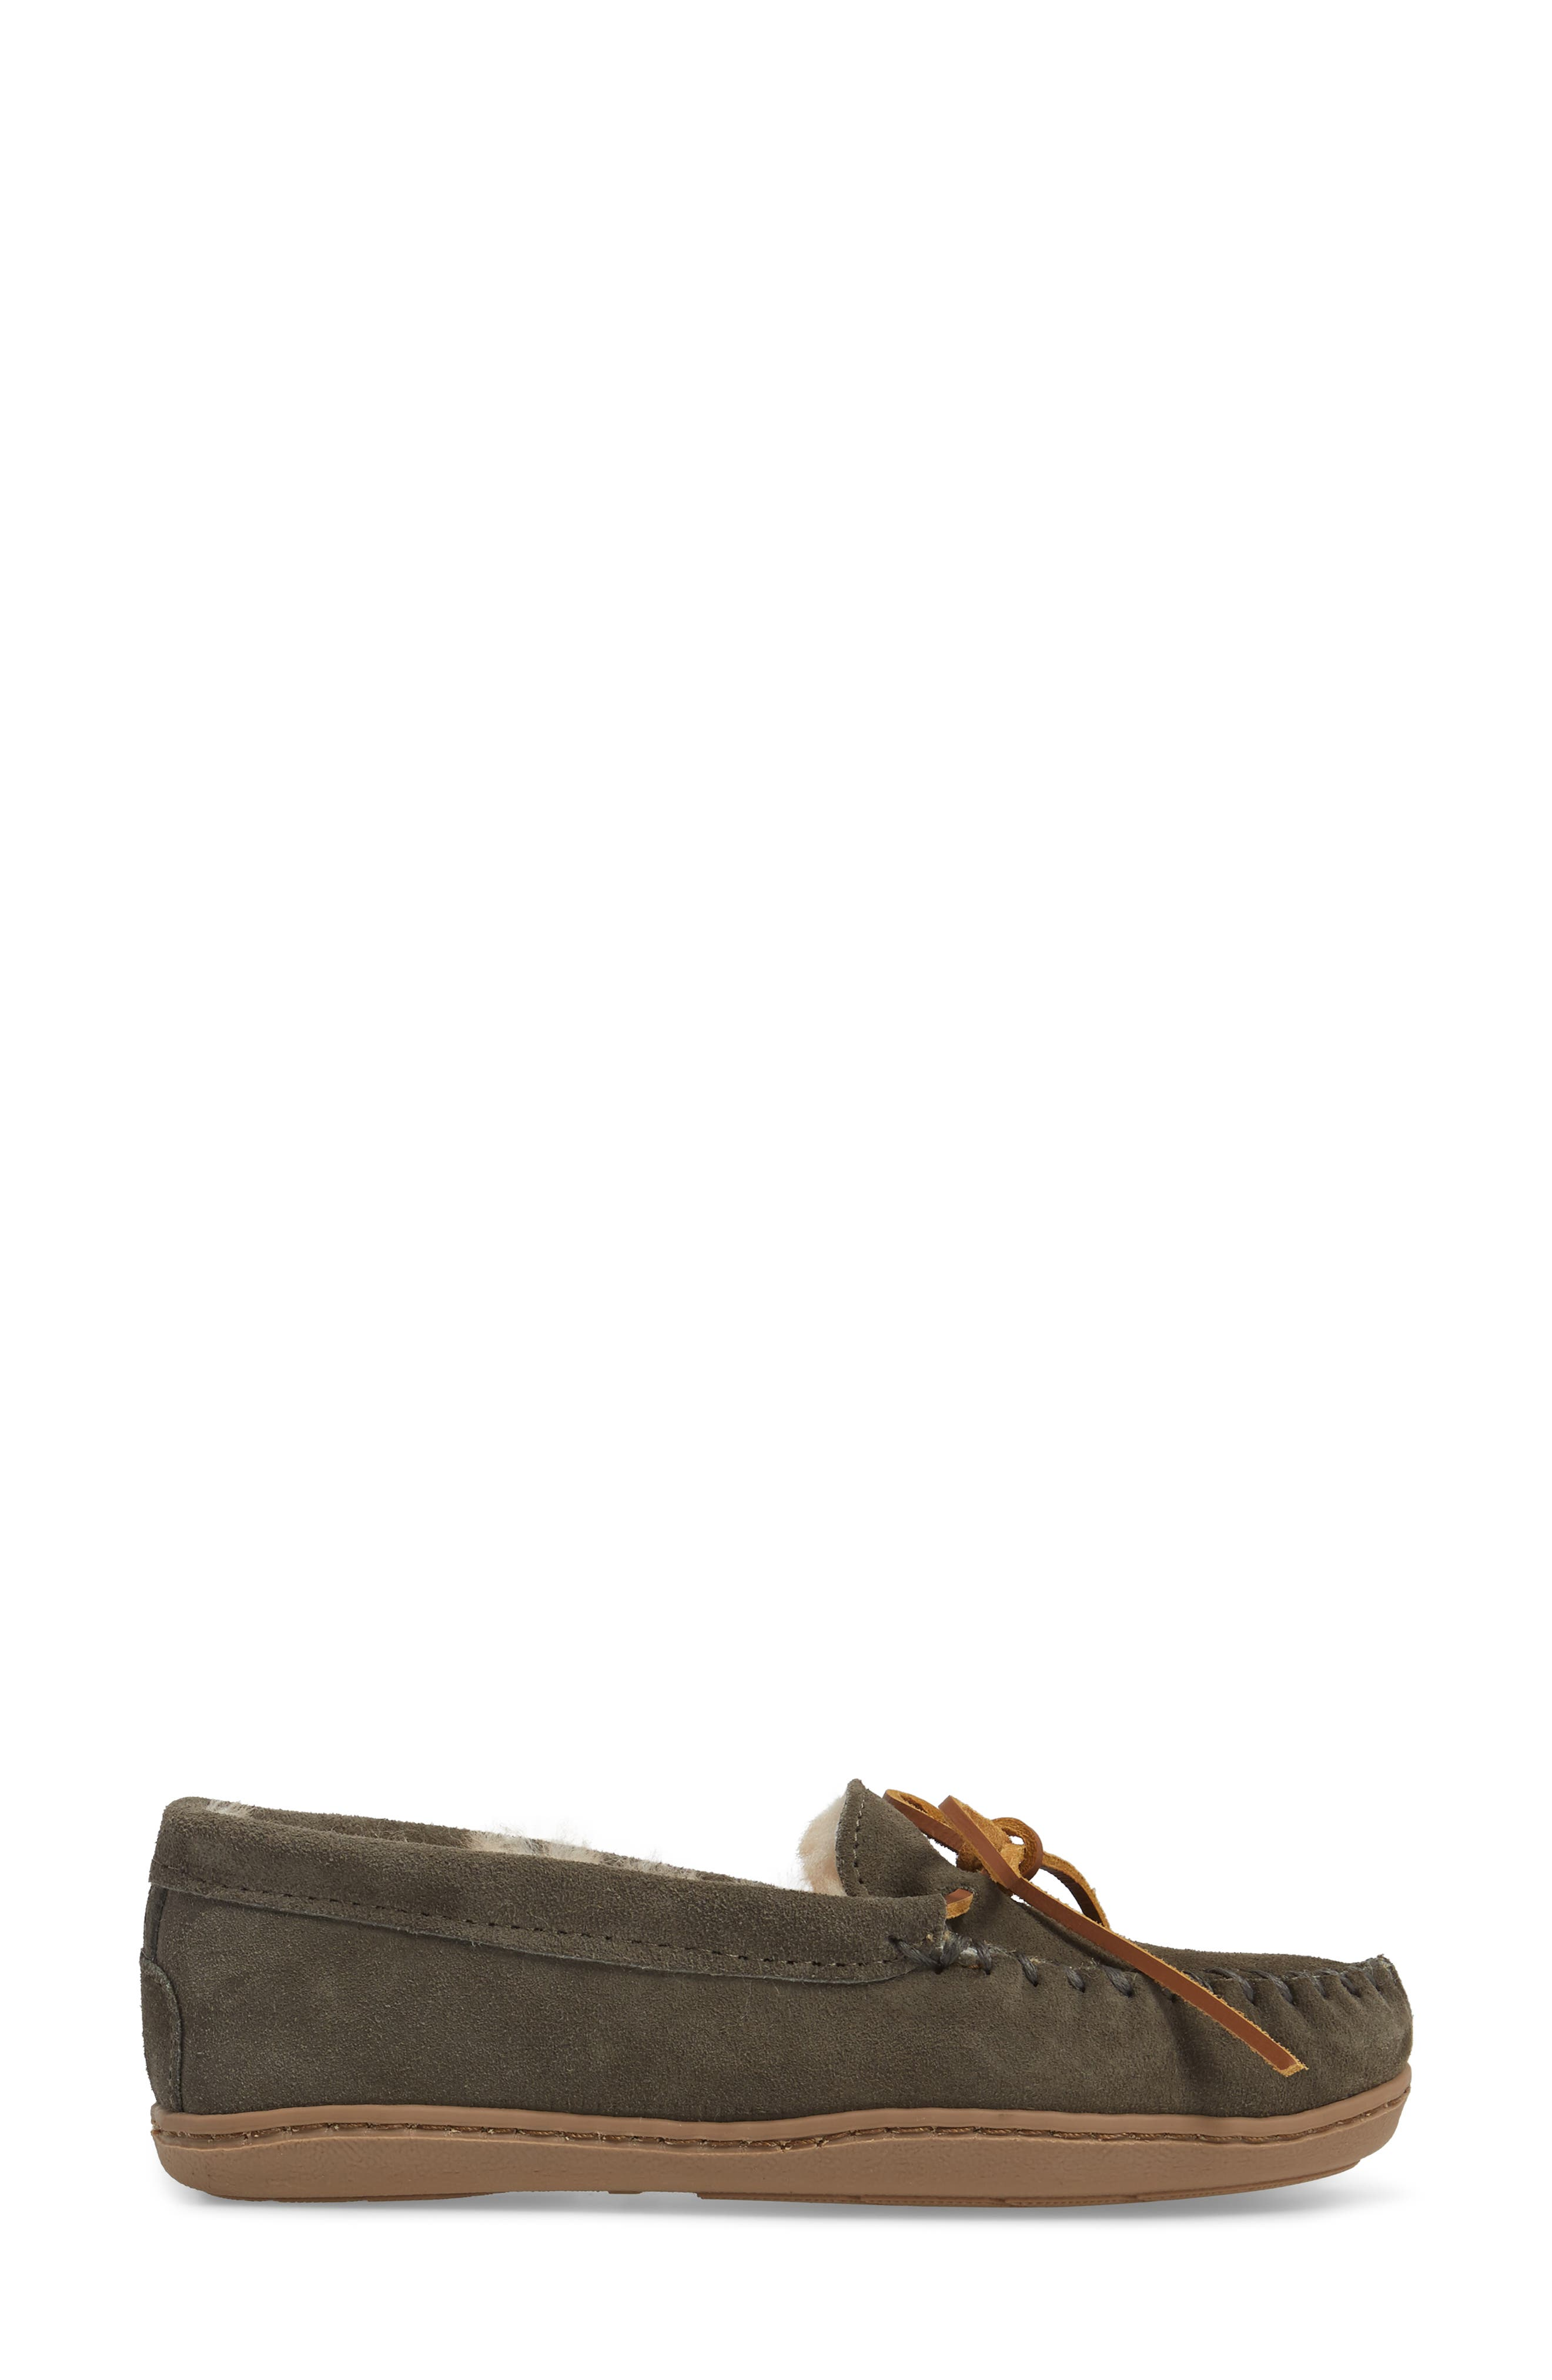 Alternate Image 3  - Minnetonka Genuine Shearling Hard Sole Moccasin Indoor/Outdoor Slipper (Women)